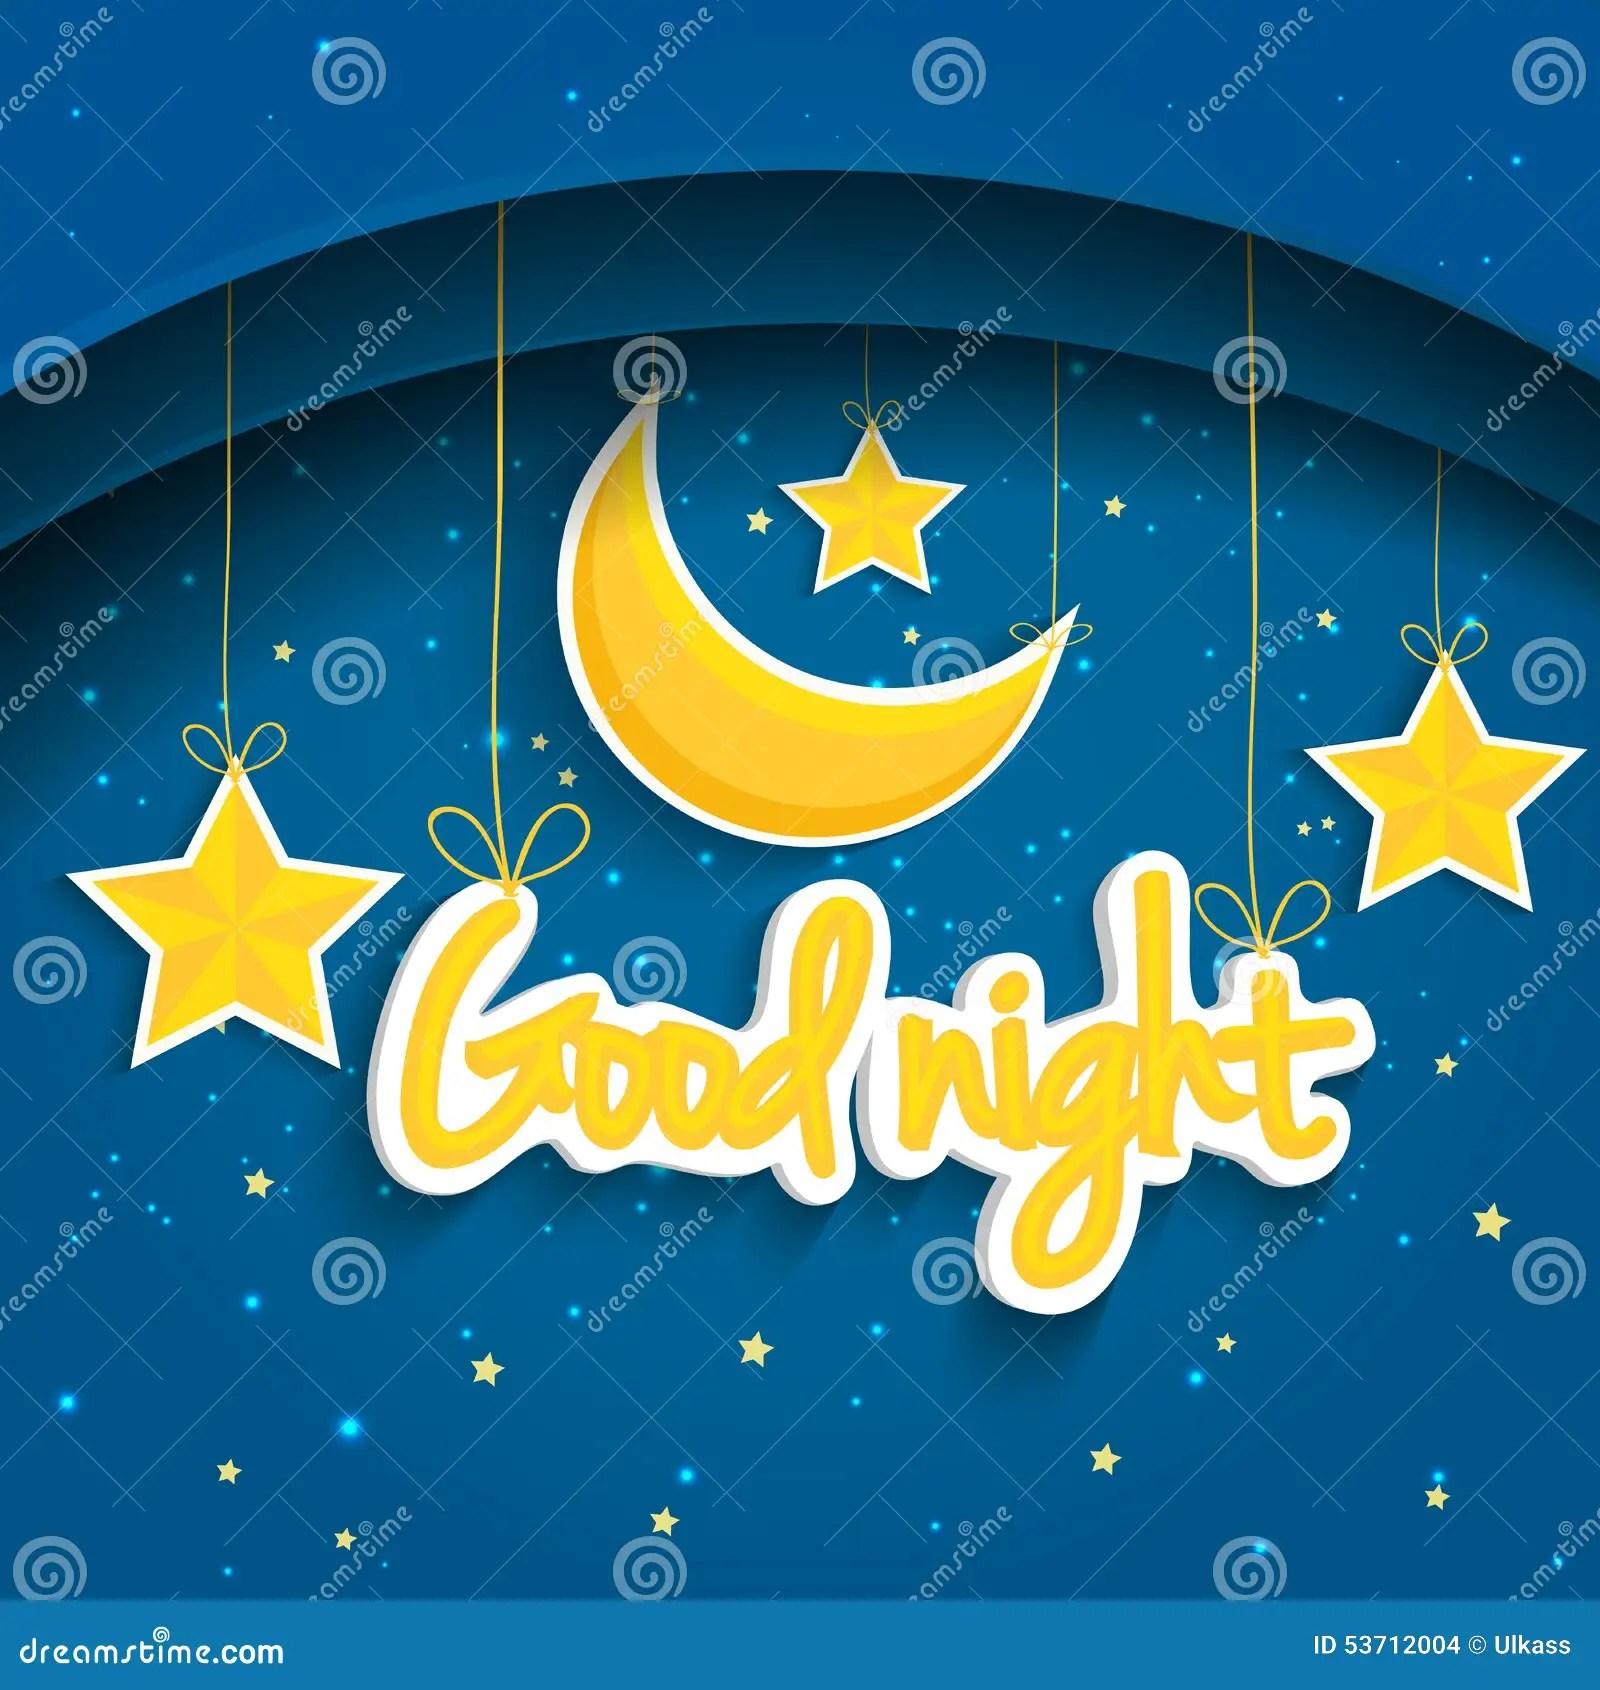 Good Afternoon Cute Wallpaper Cartoon Star And Moon Wishing Good Night Vector